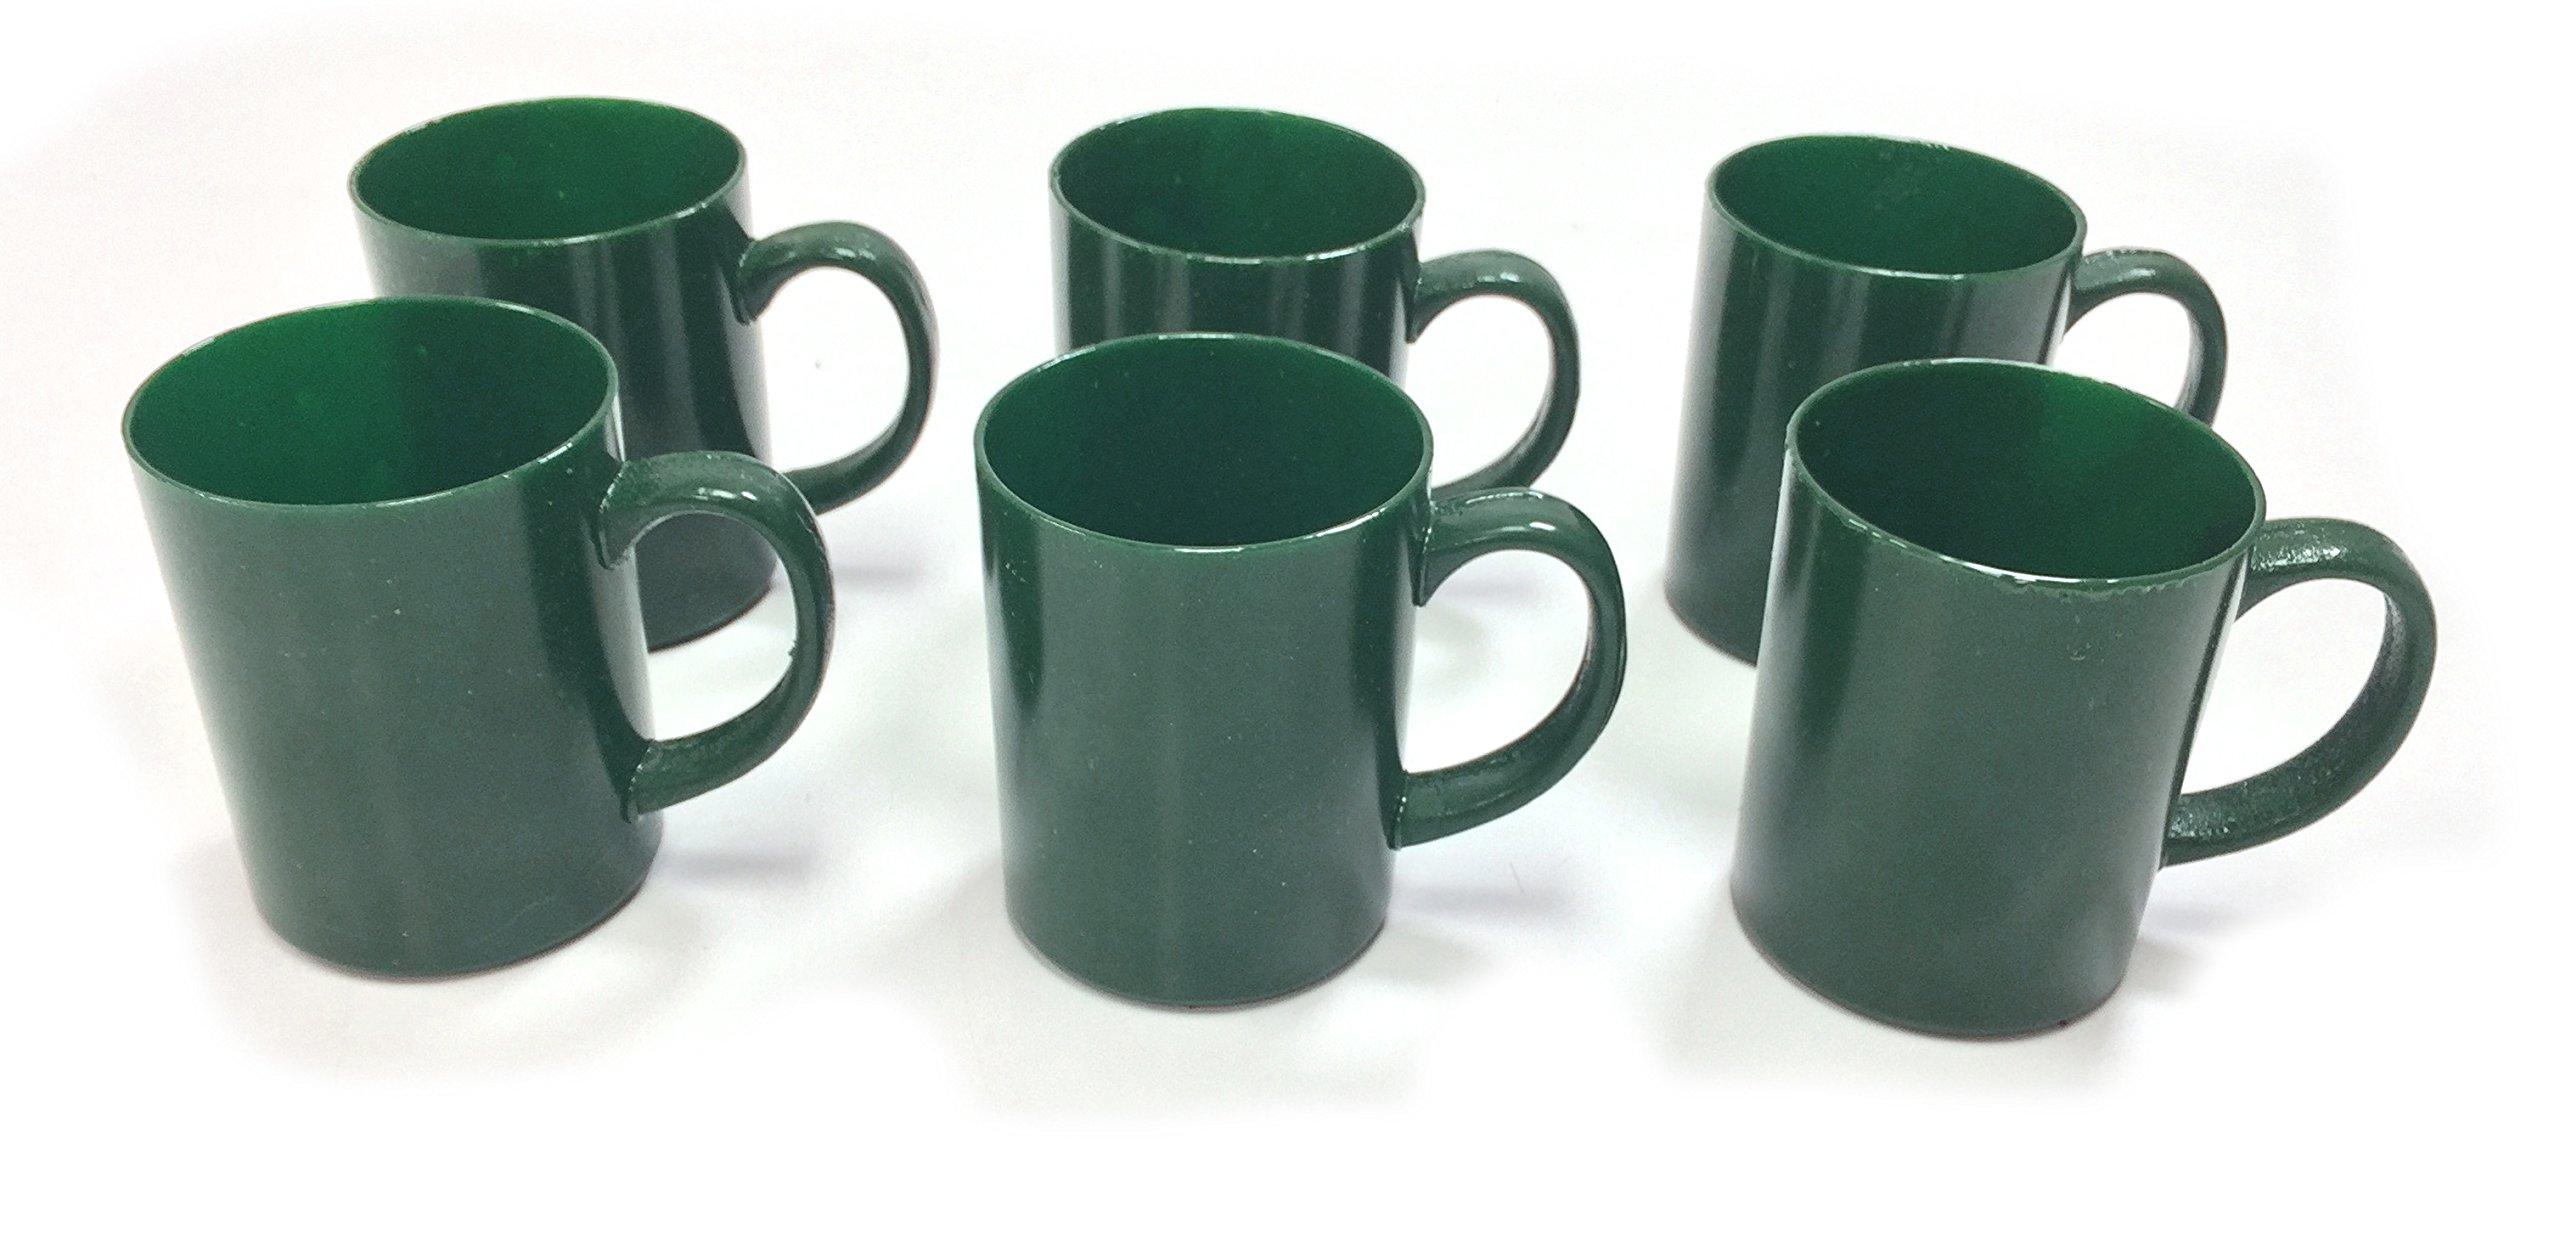 SMASHProps 6 pc. Green Breakaway Mugs Discount Set by NewRuleFX (Image #2)